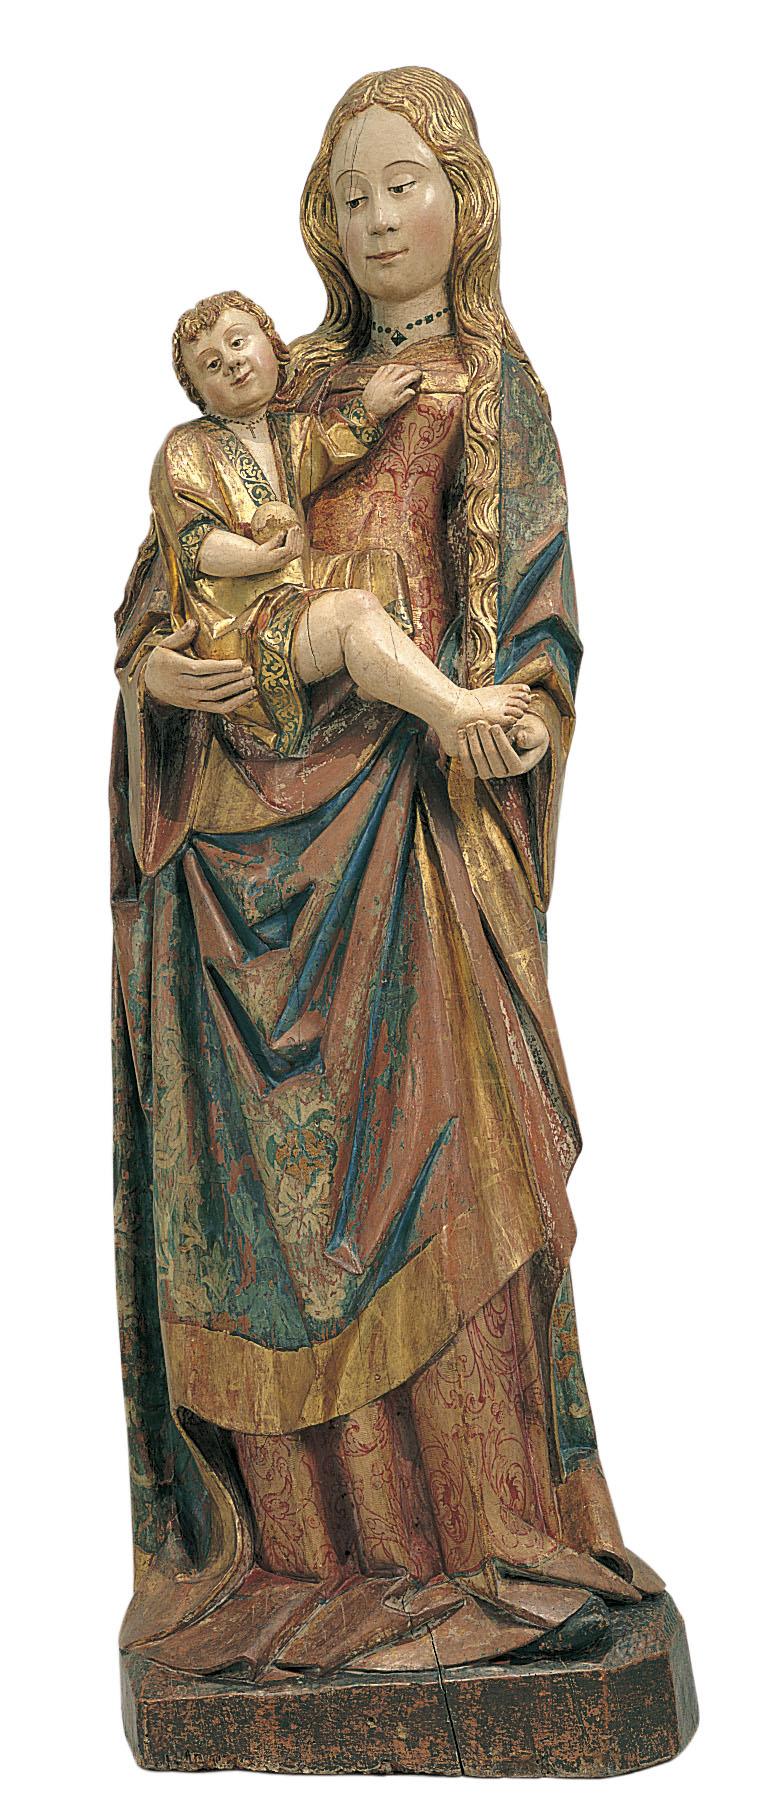 Gil de Brabante - Mare de Déu - Cap a 1500